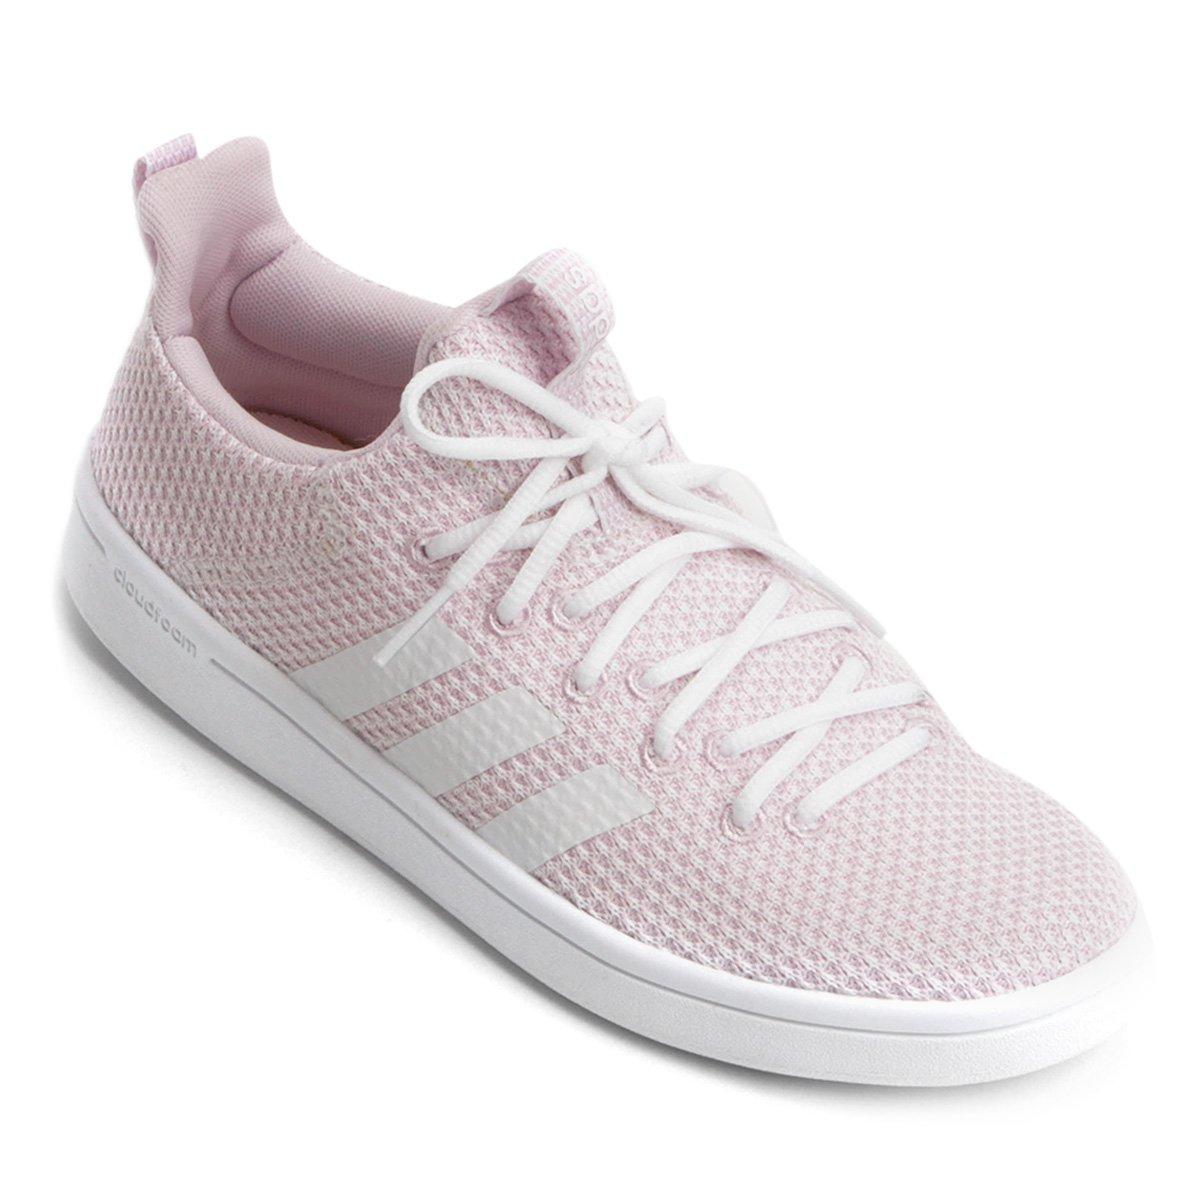 8d2cec6a17 Tênis Adidas Cloudfoam Advantage Adapt Feminino - Compre Agora ...